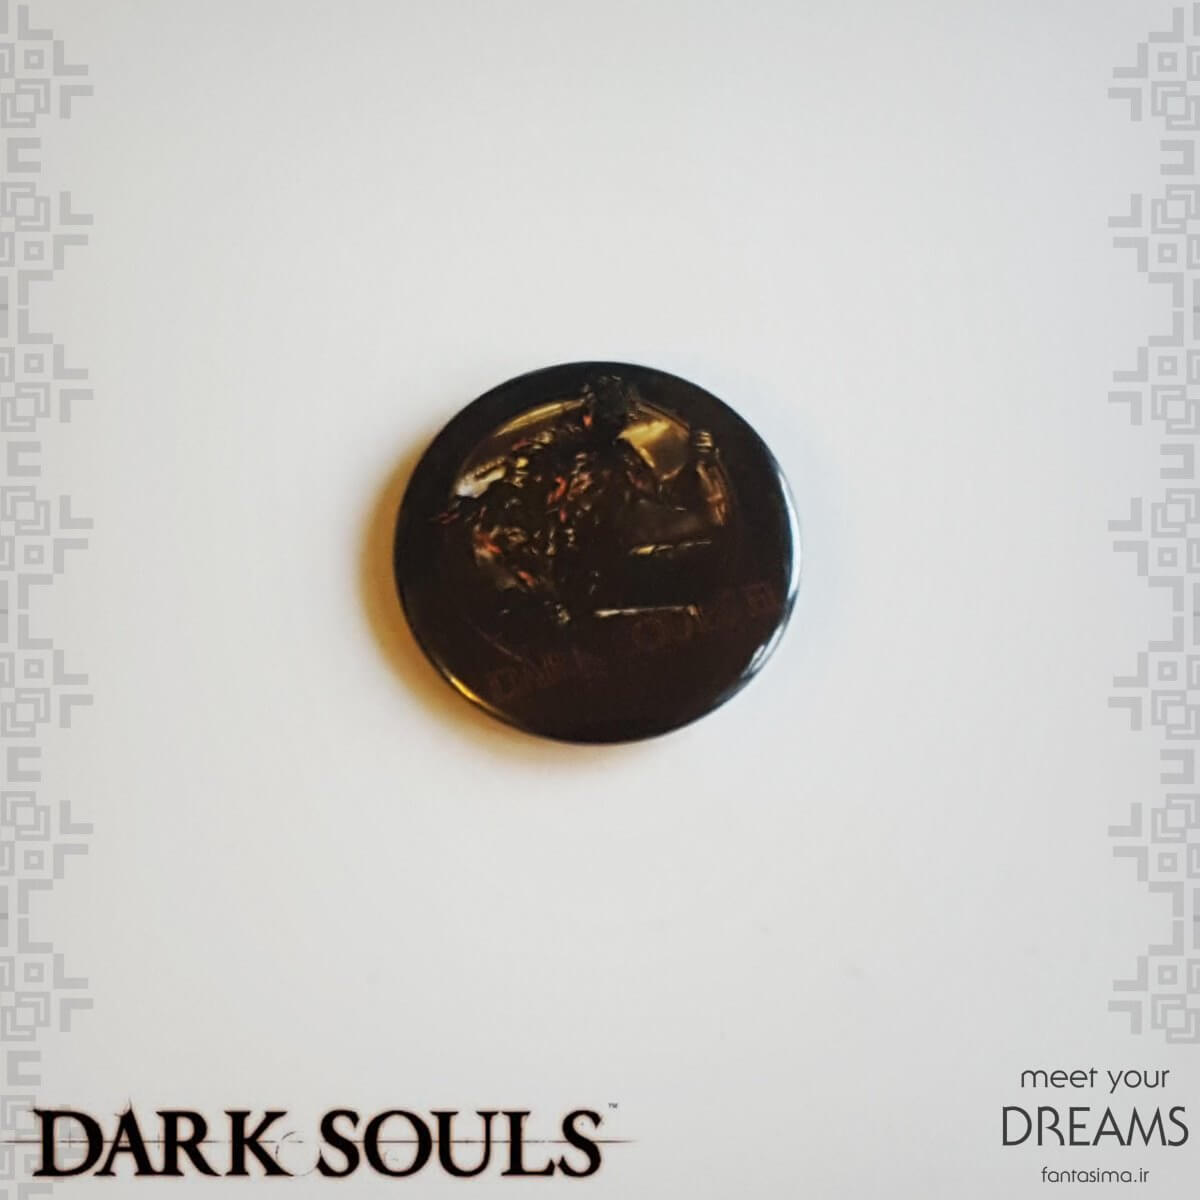 پیکسل فلزی darksouls III